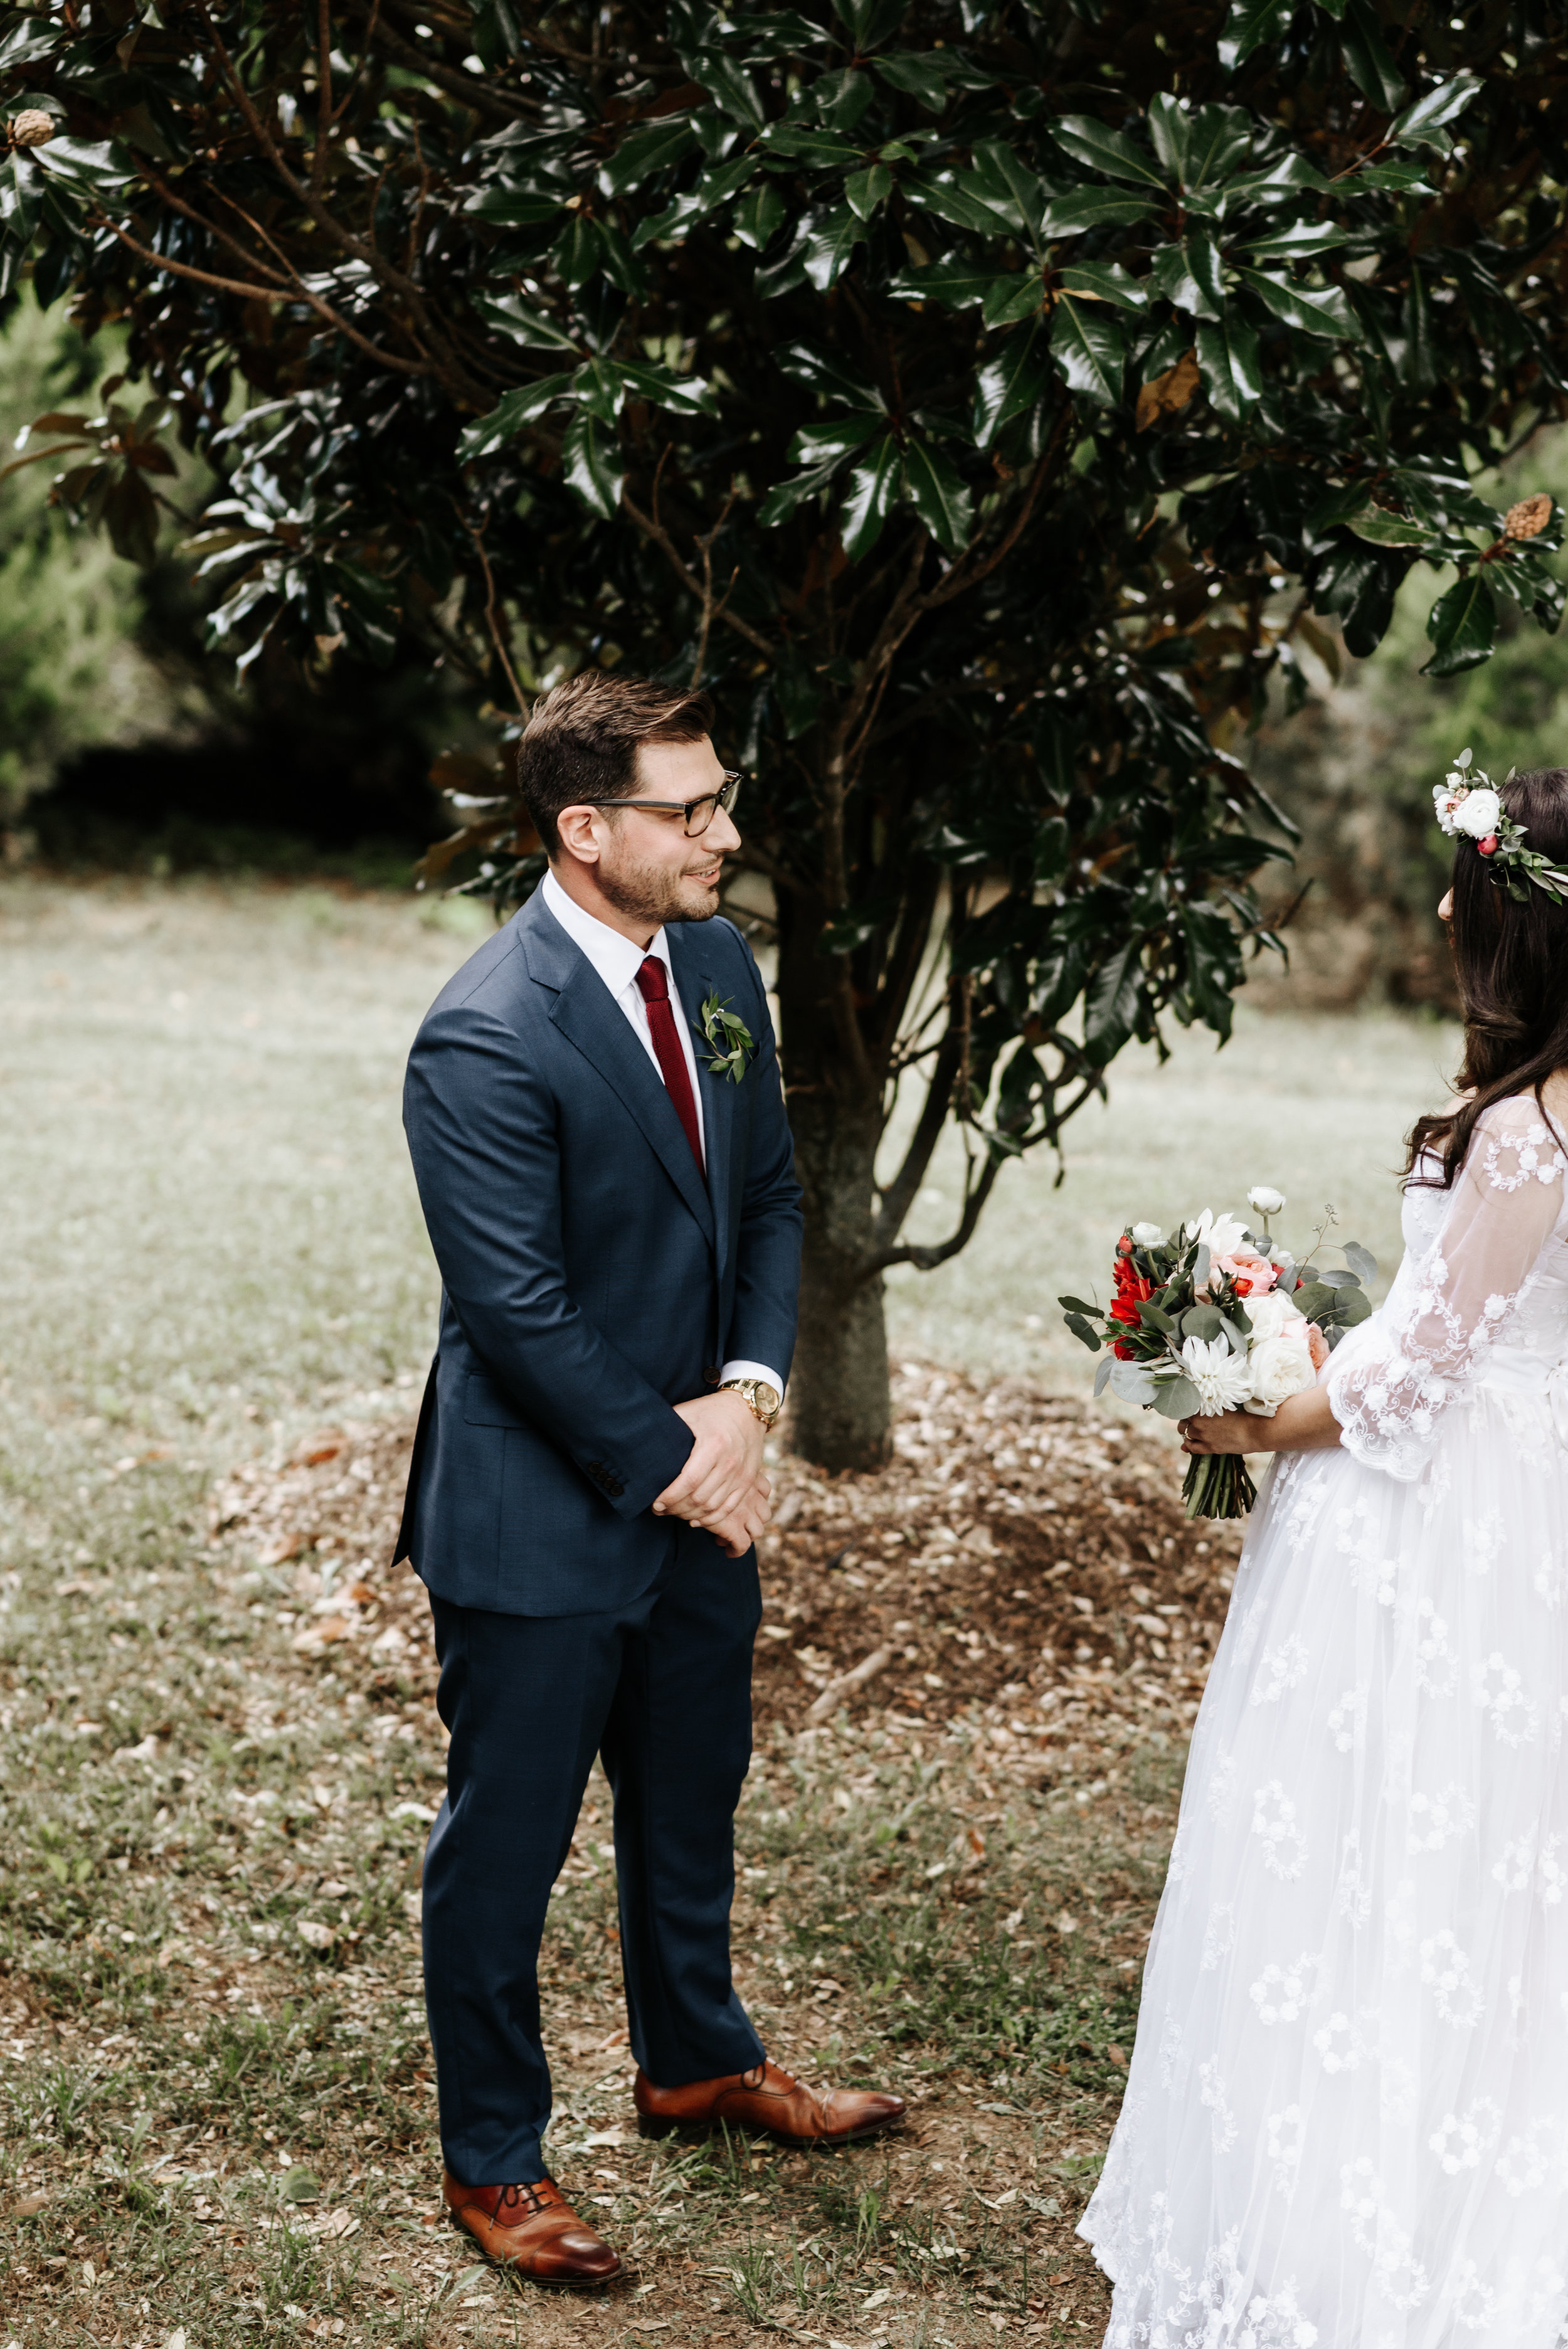 Veritas-Vineyards-and-Winery-Wedding-Photography-Afton-Virginia-Yasmin-Seth-Photography-by-V-2190.jpg